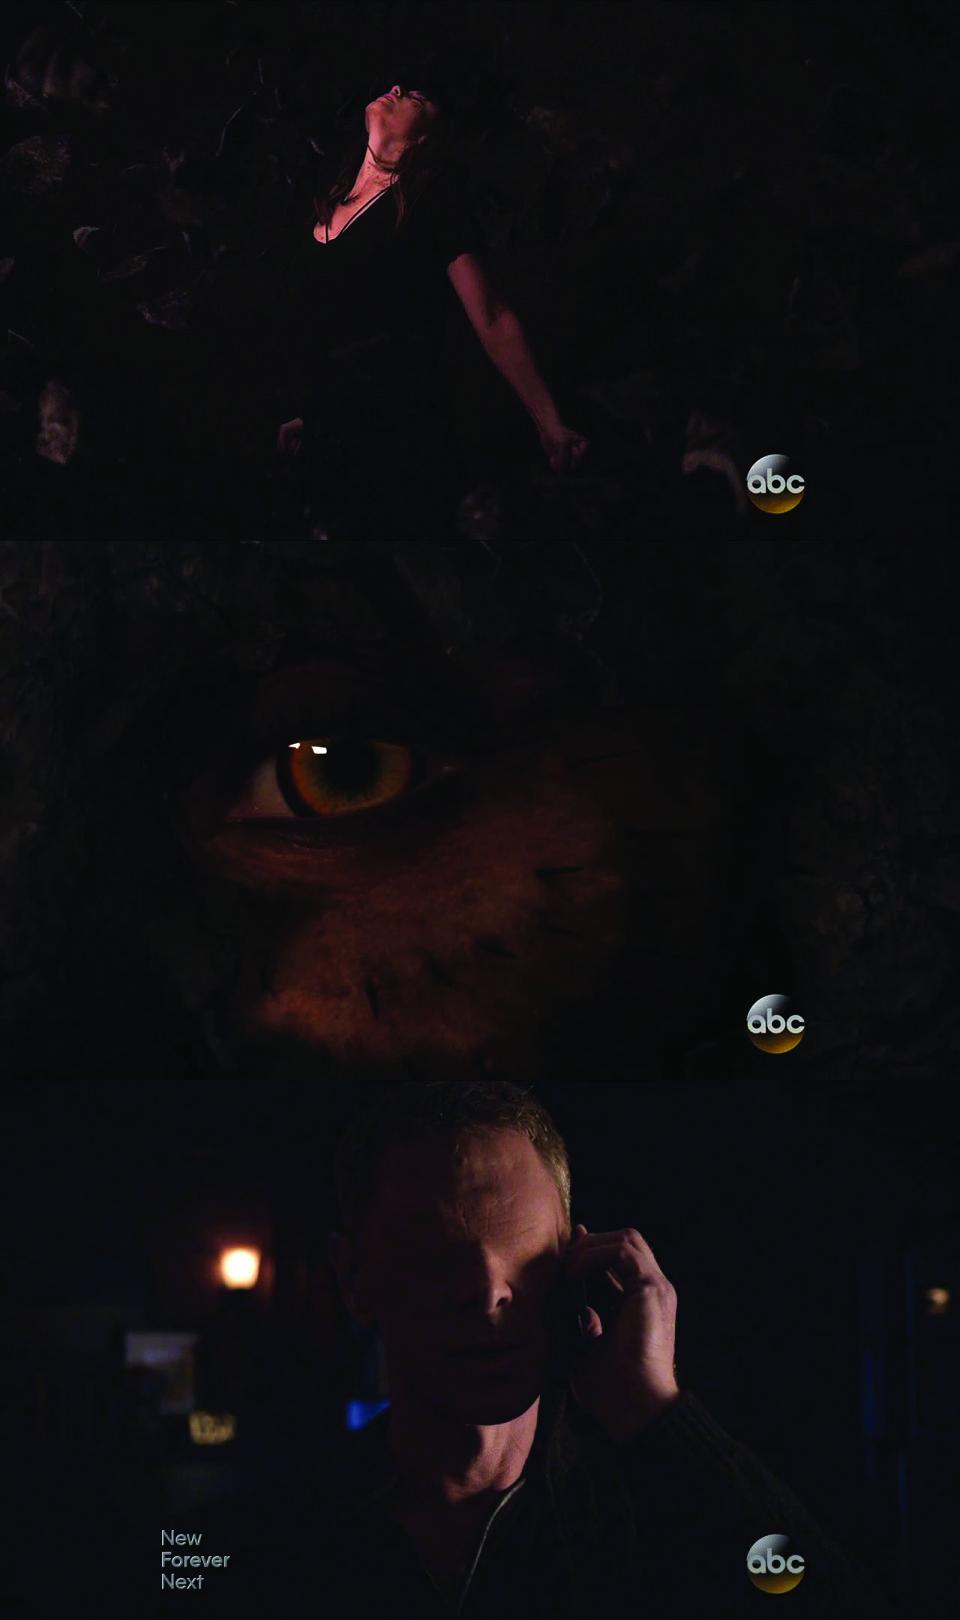 [TV] Agents of SHIELD (3ª Temporada) - Secret Warriors confirmados! - Página 14 B4g4c7cIAAEhGyn